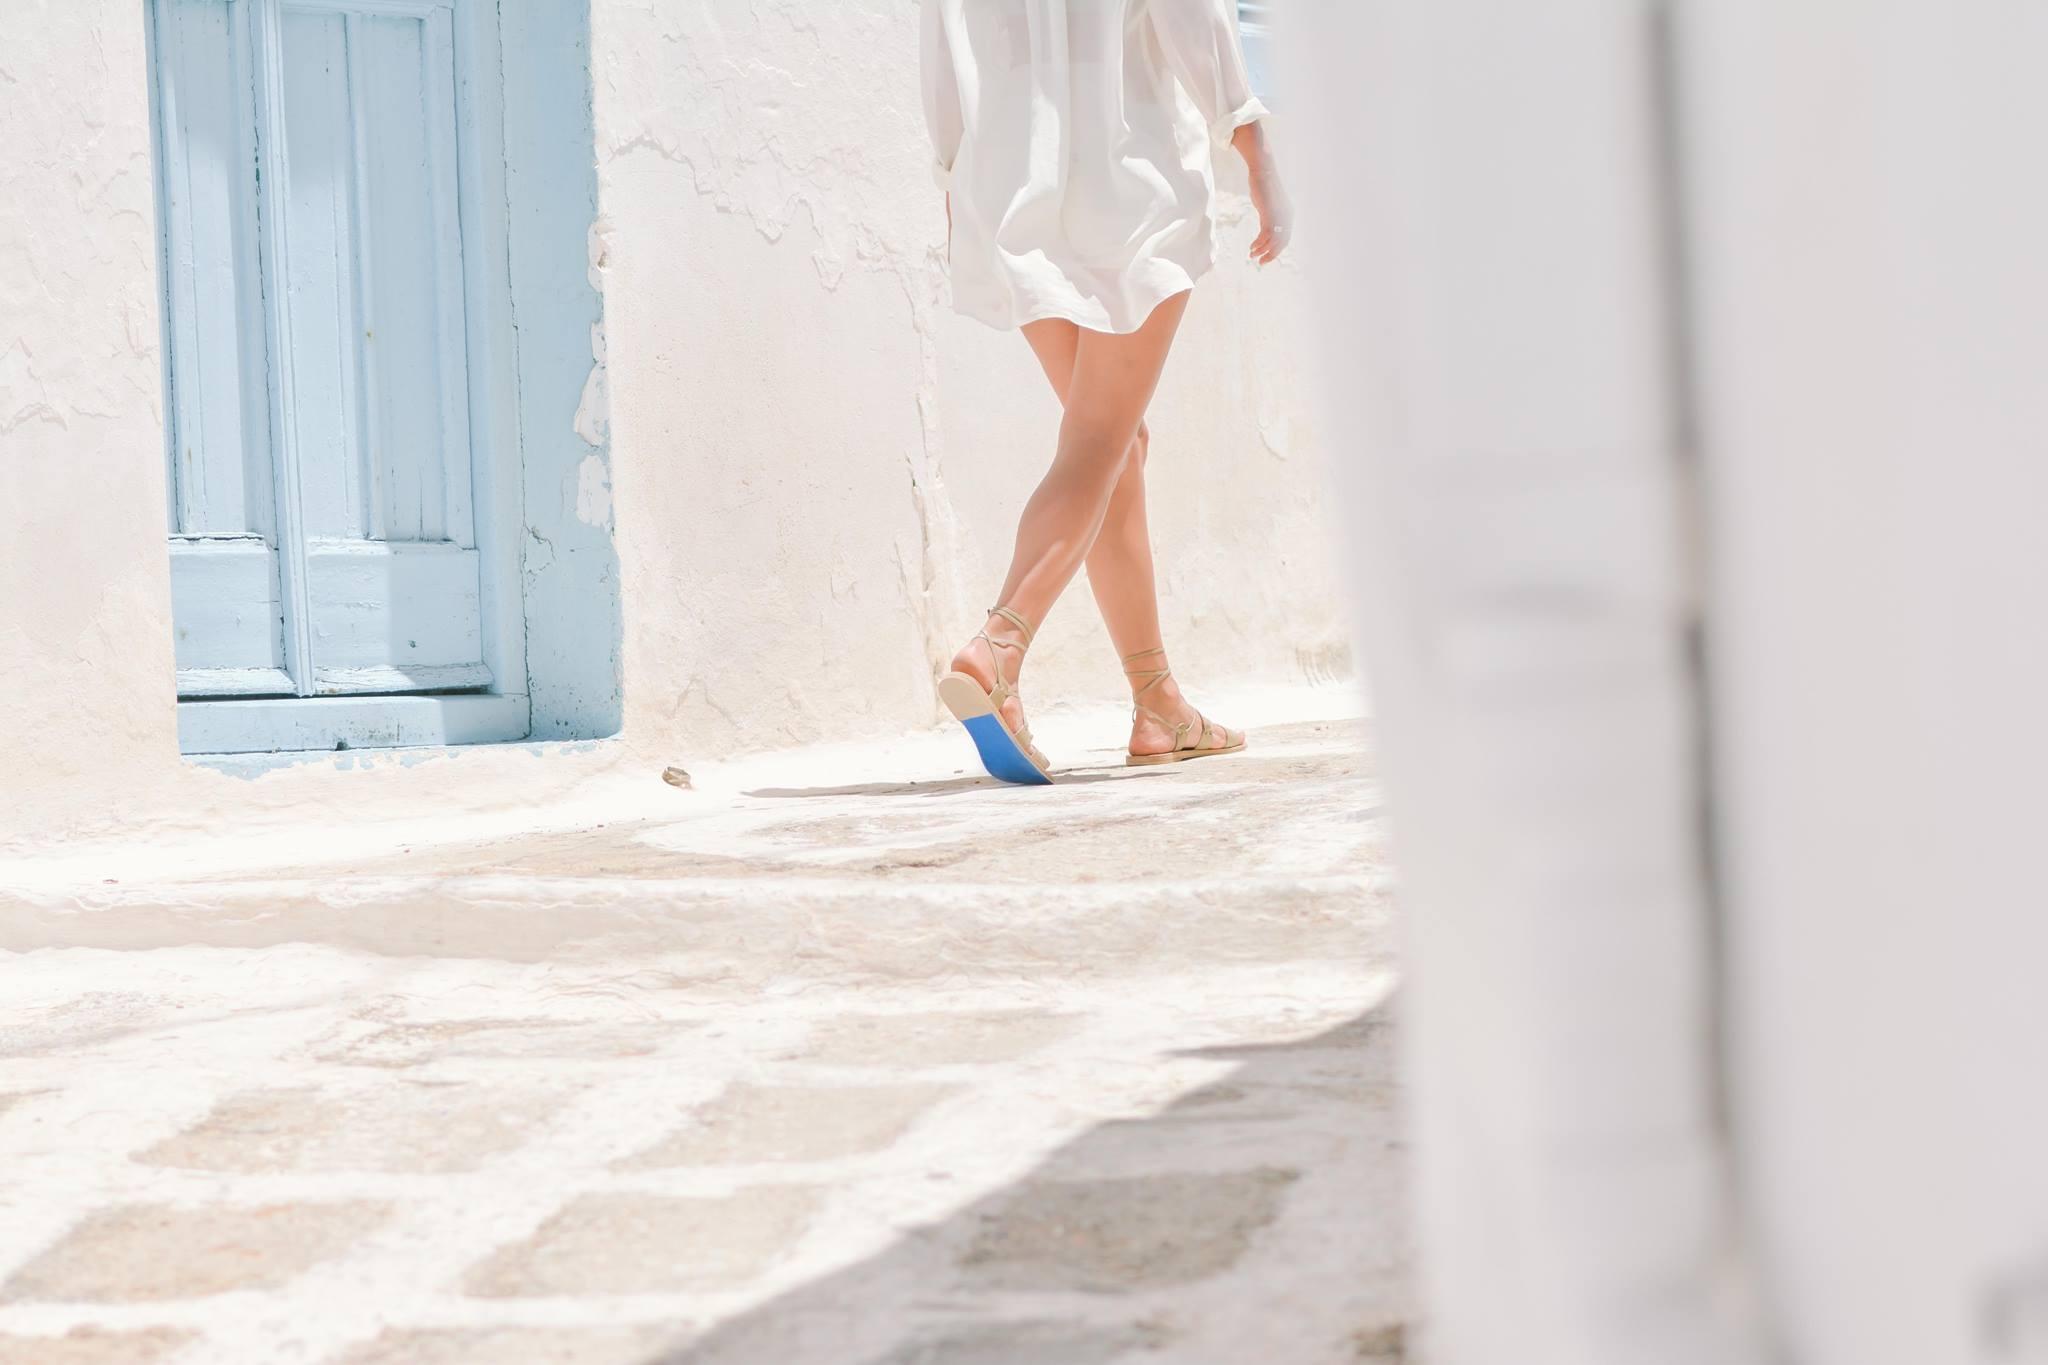 KYMA Handmade Sandals.